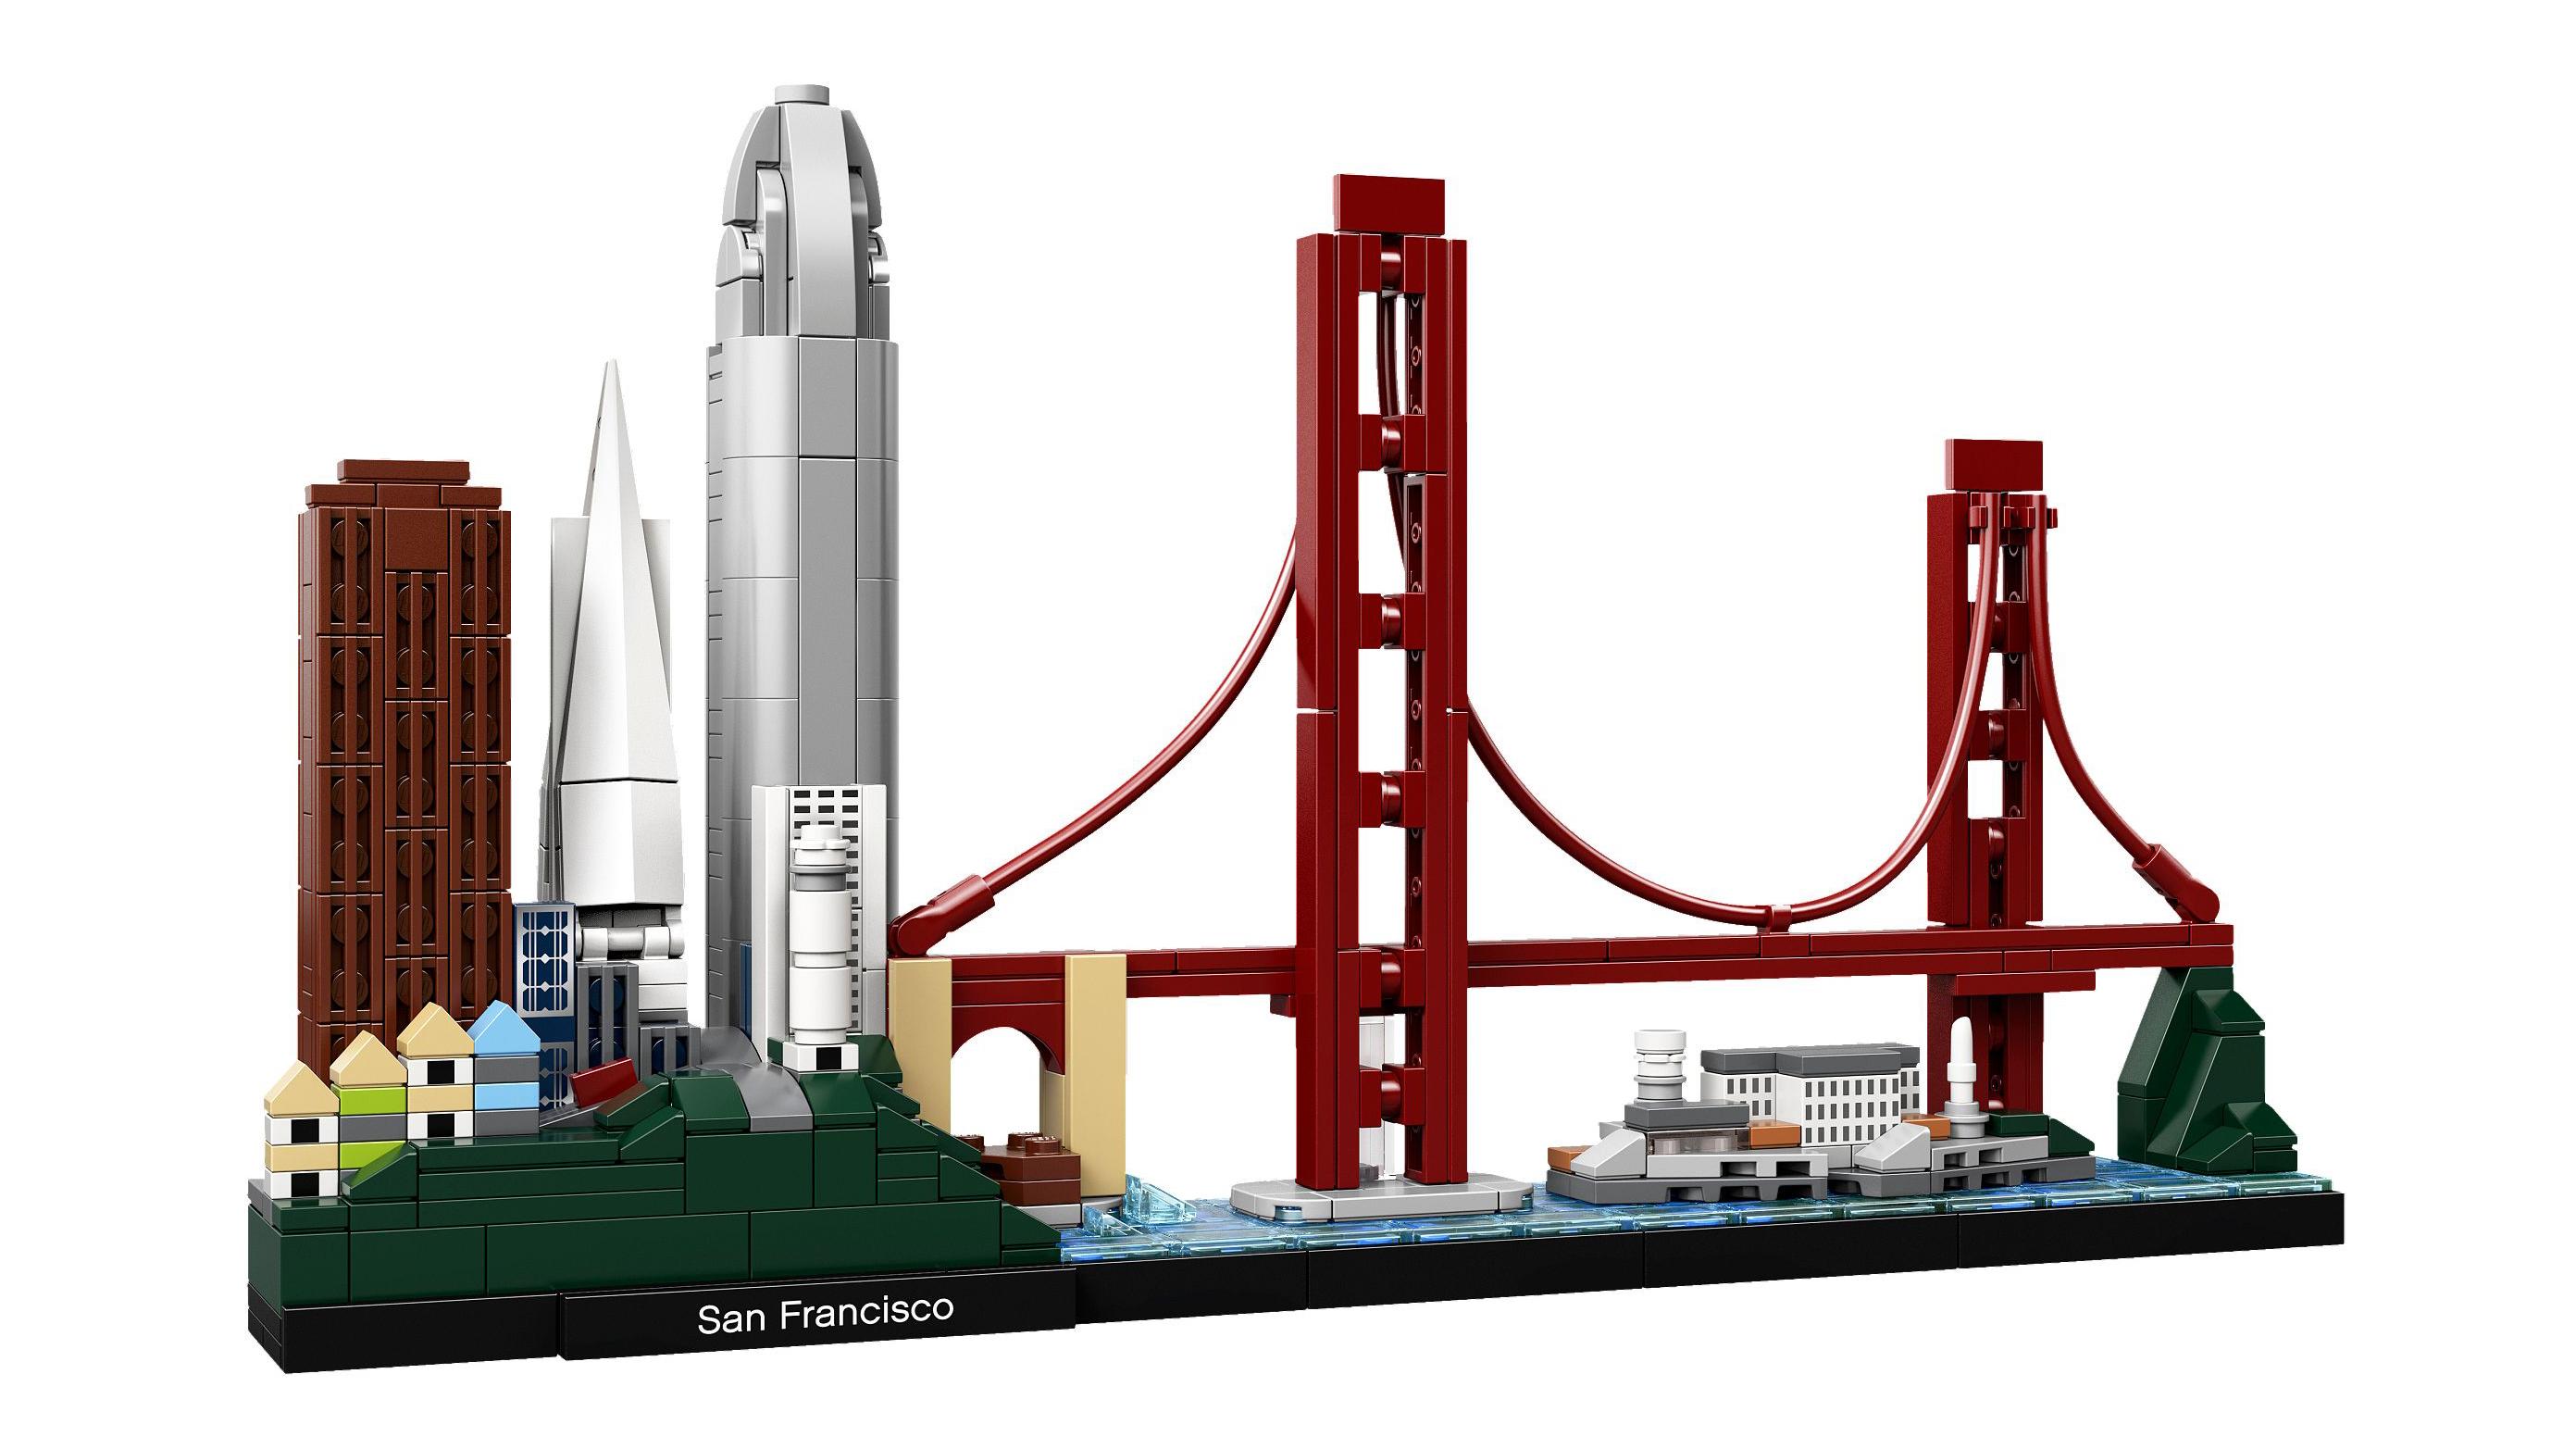 Best Lego Architecture sets: San Francisco